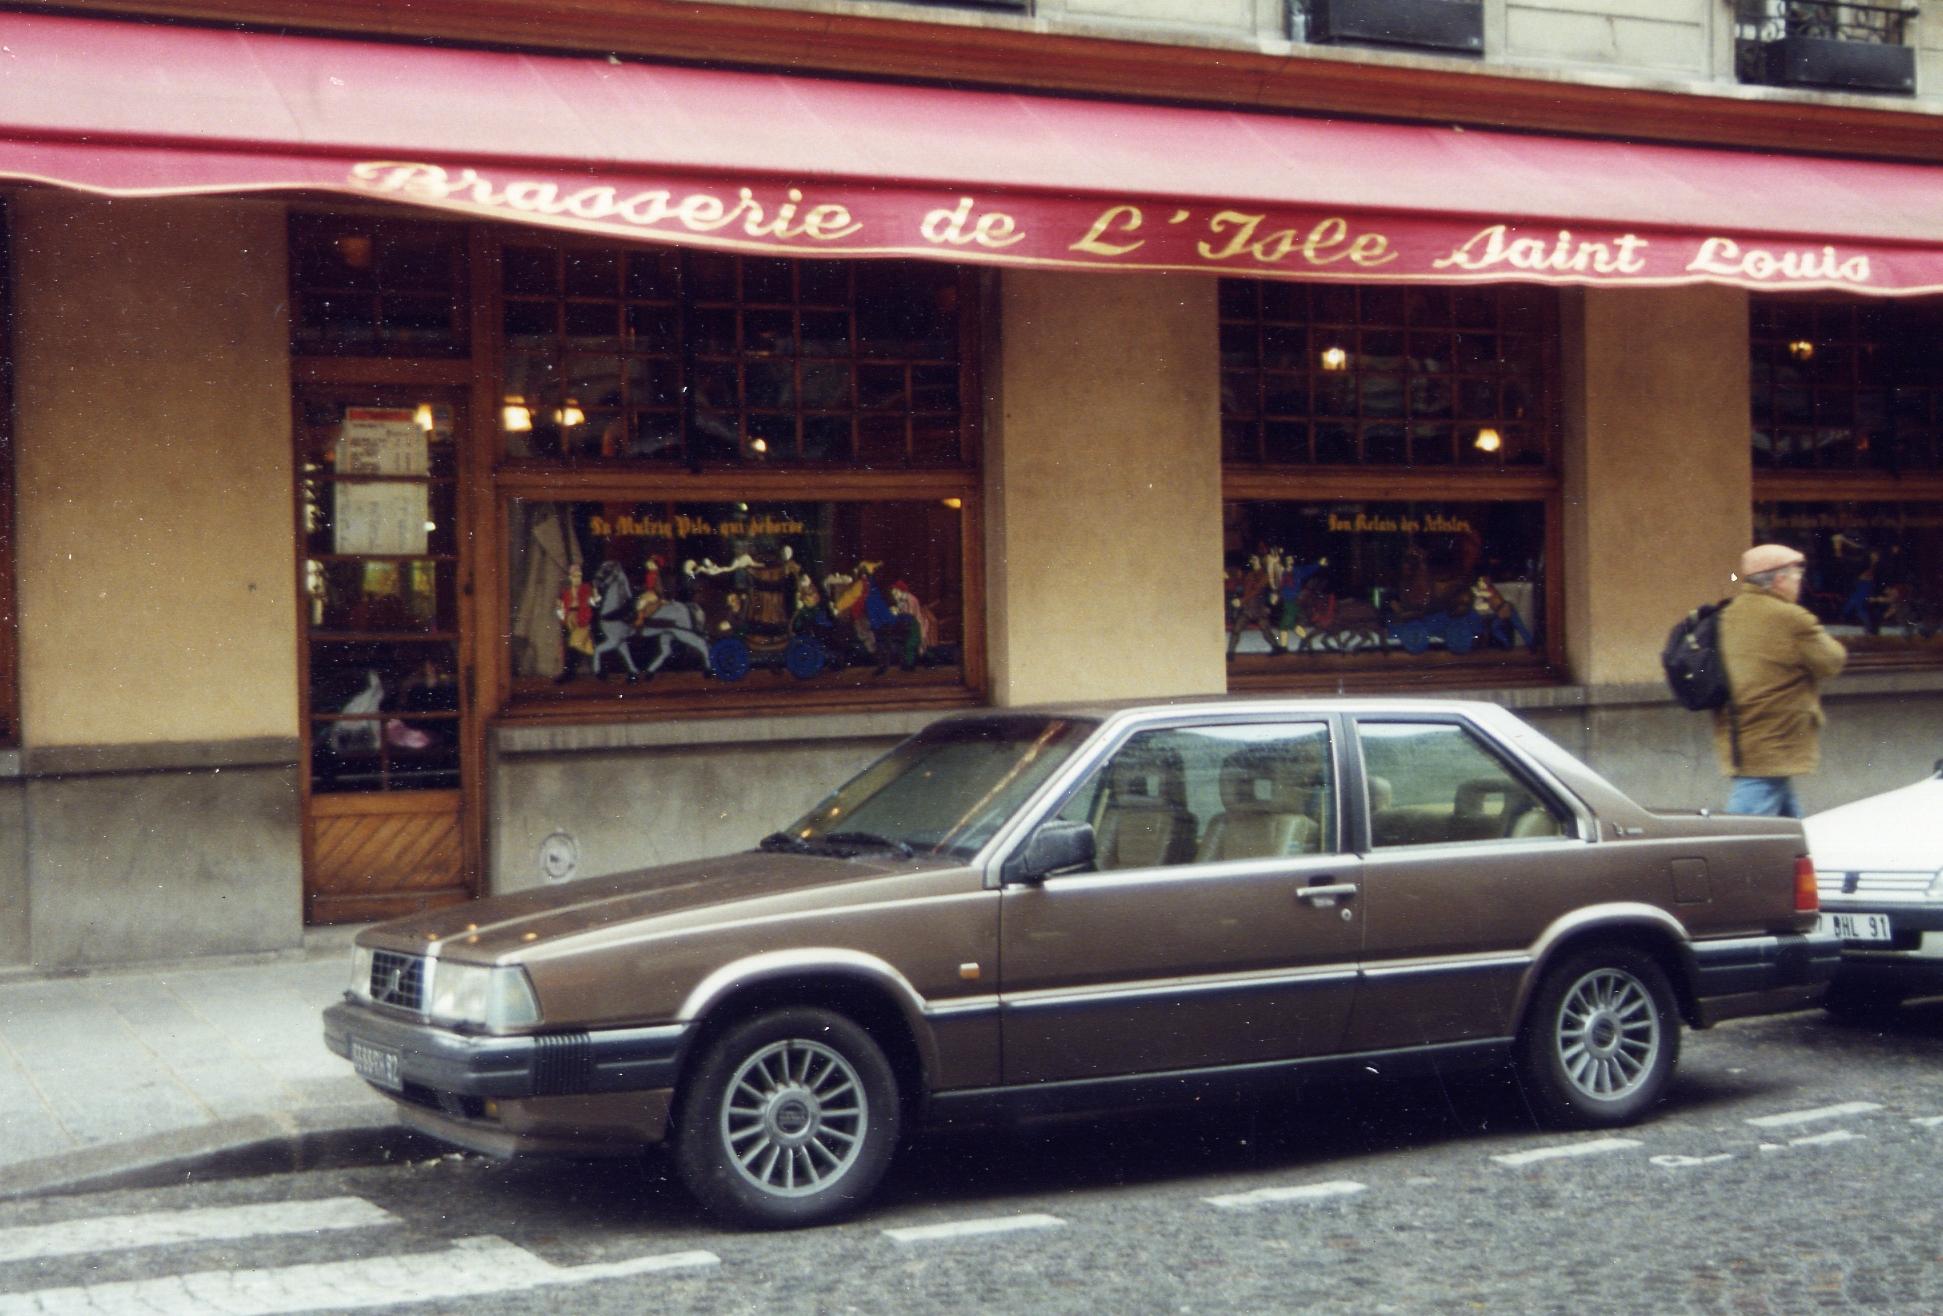 Volvo 780 Bertone in Paris, France.jpg